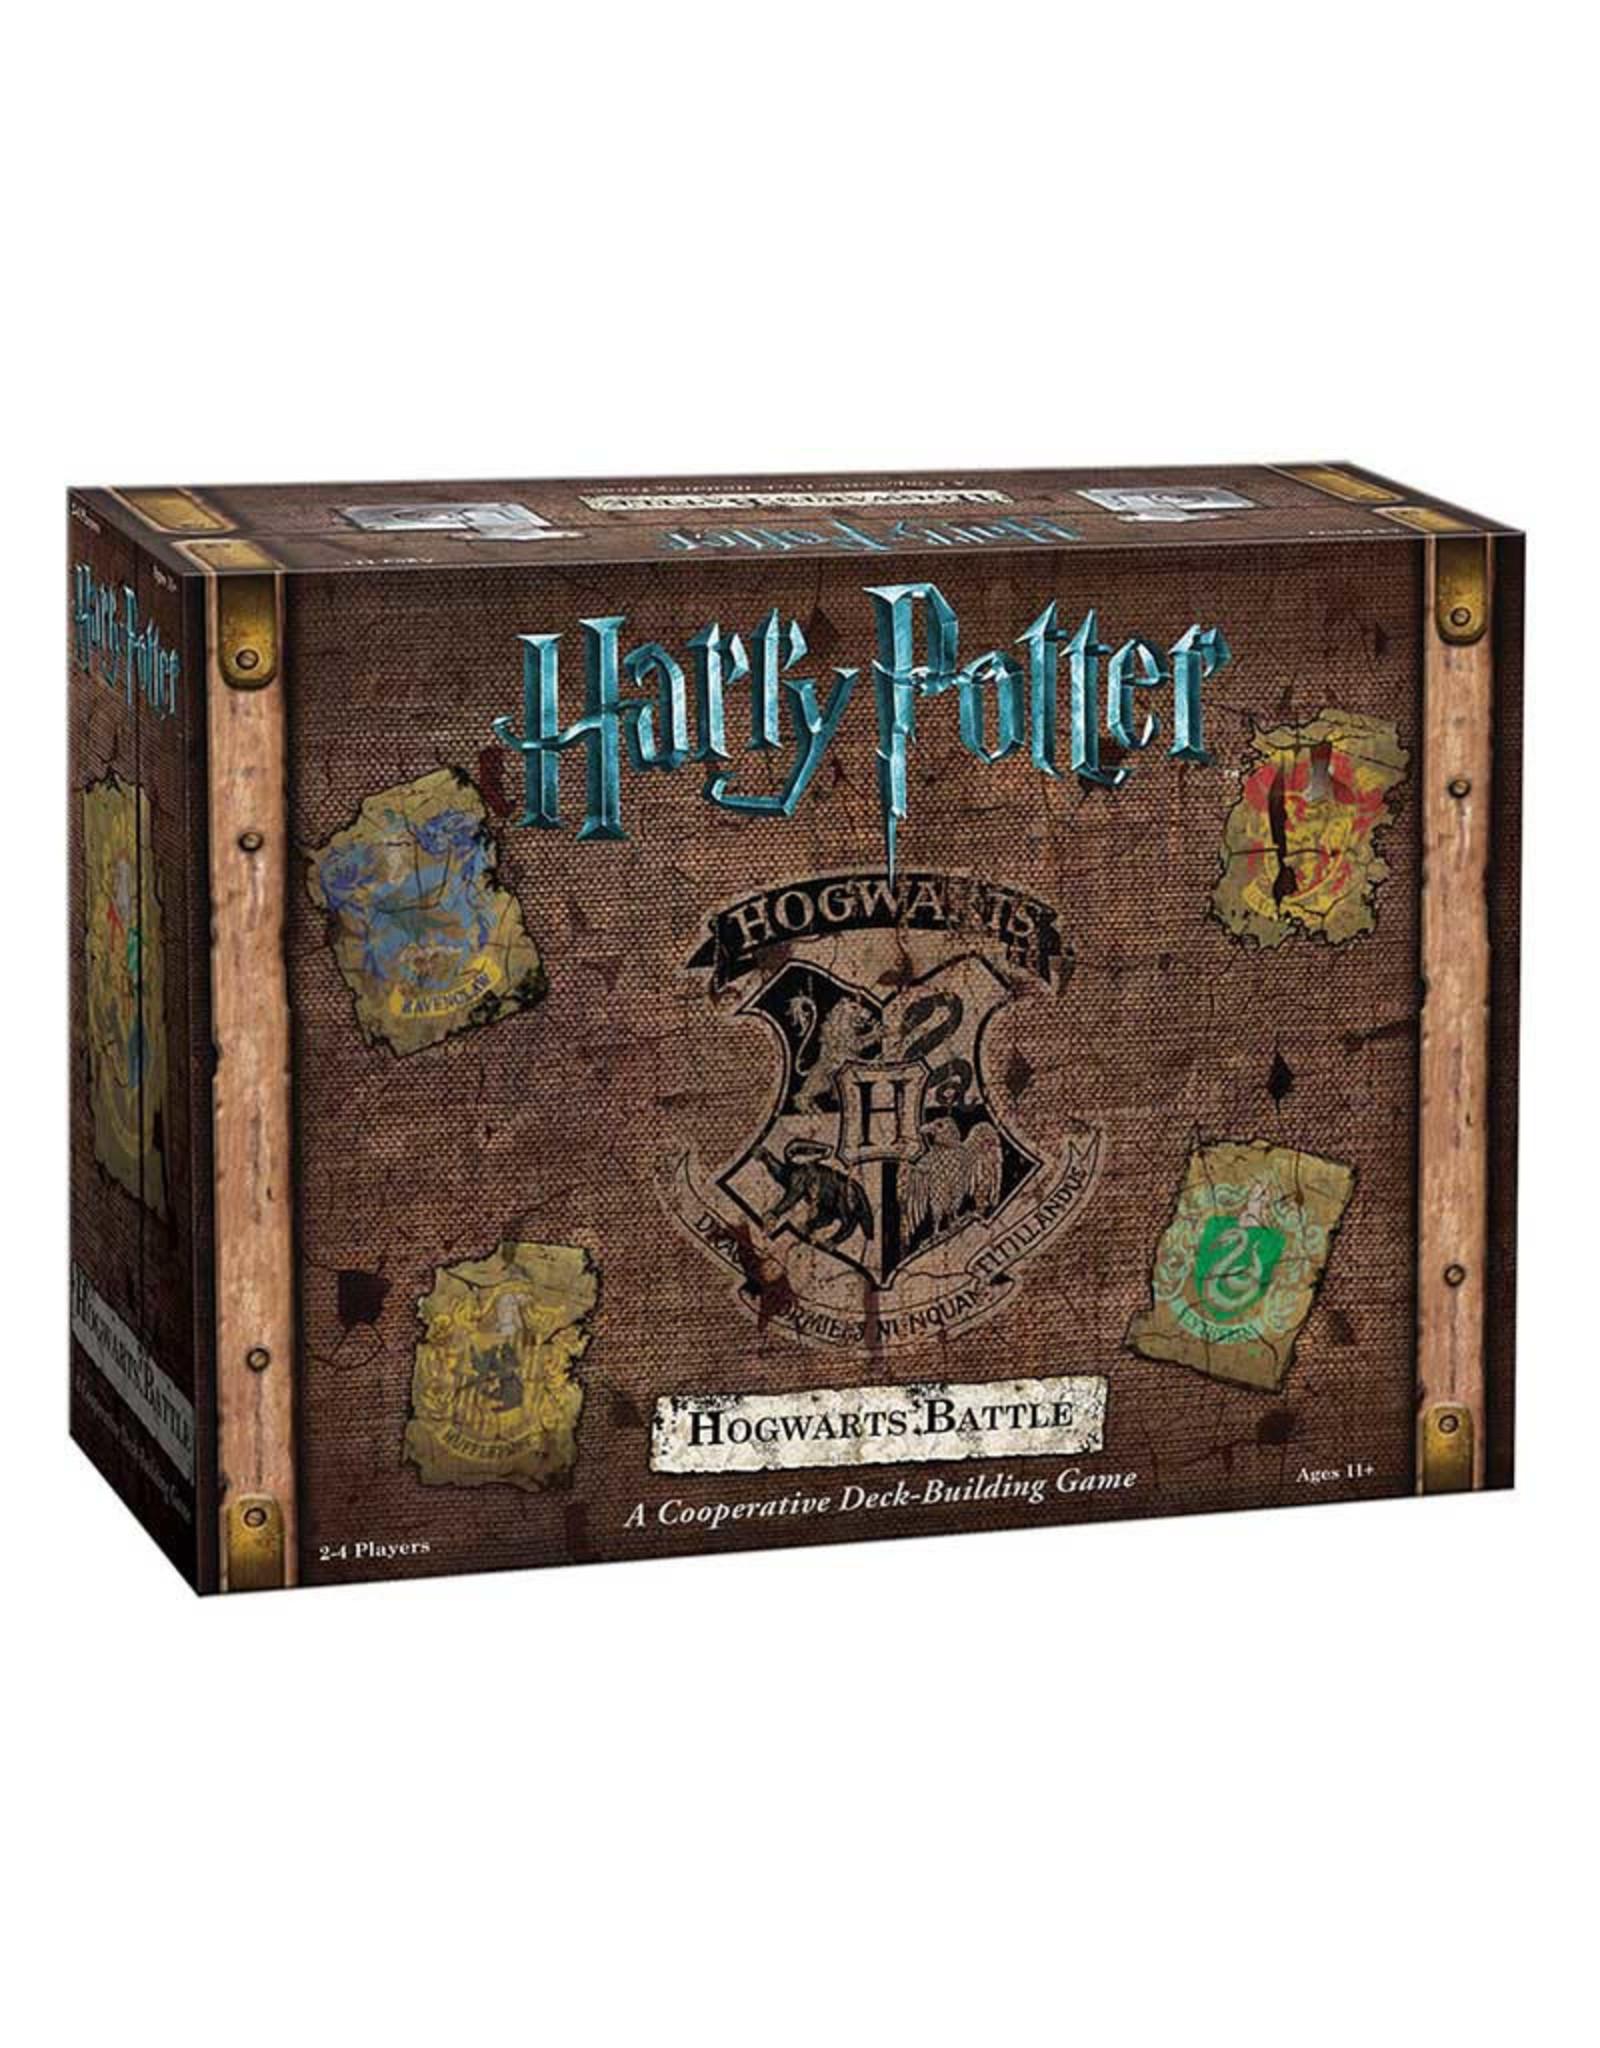 USAopoly Harry Potter Hogwarts Battle